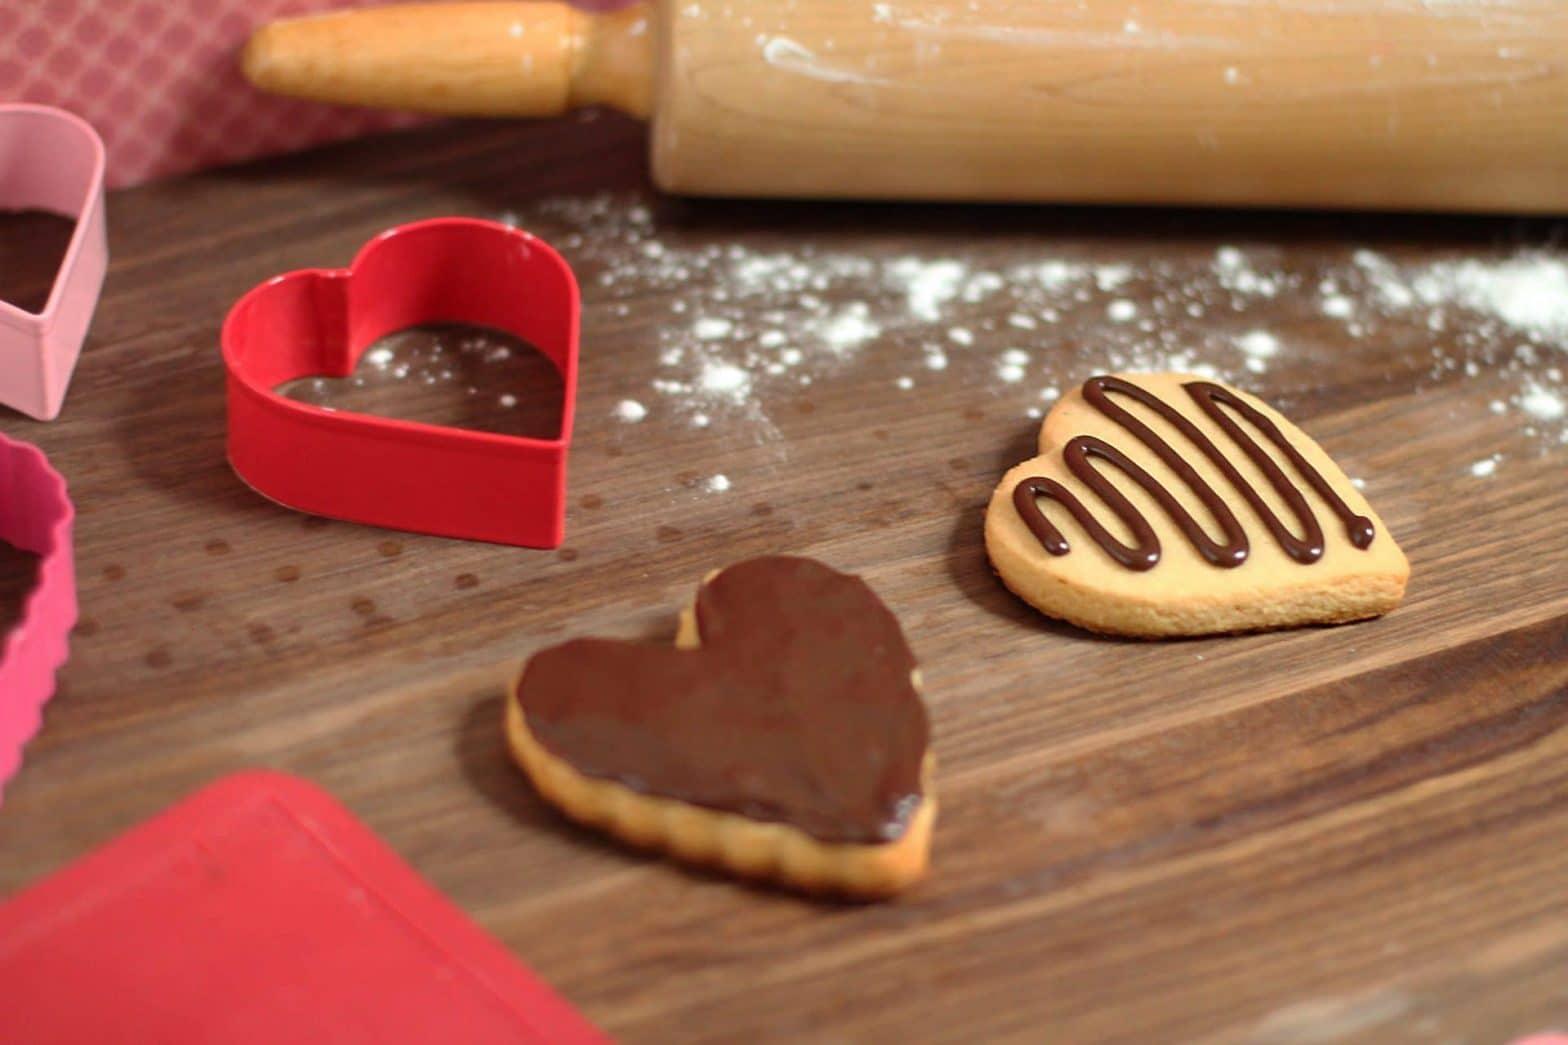 Paleo Chocolate Salted Caramel Icing